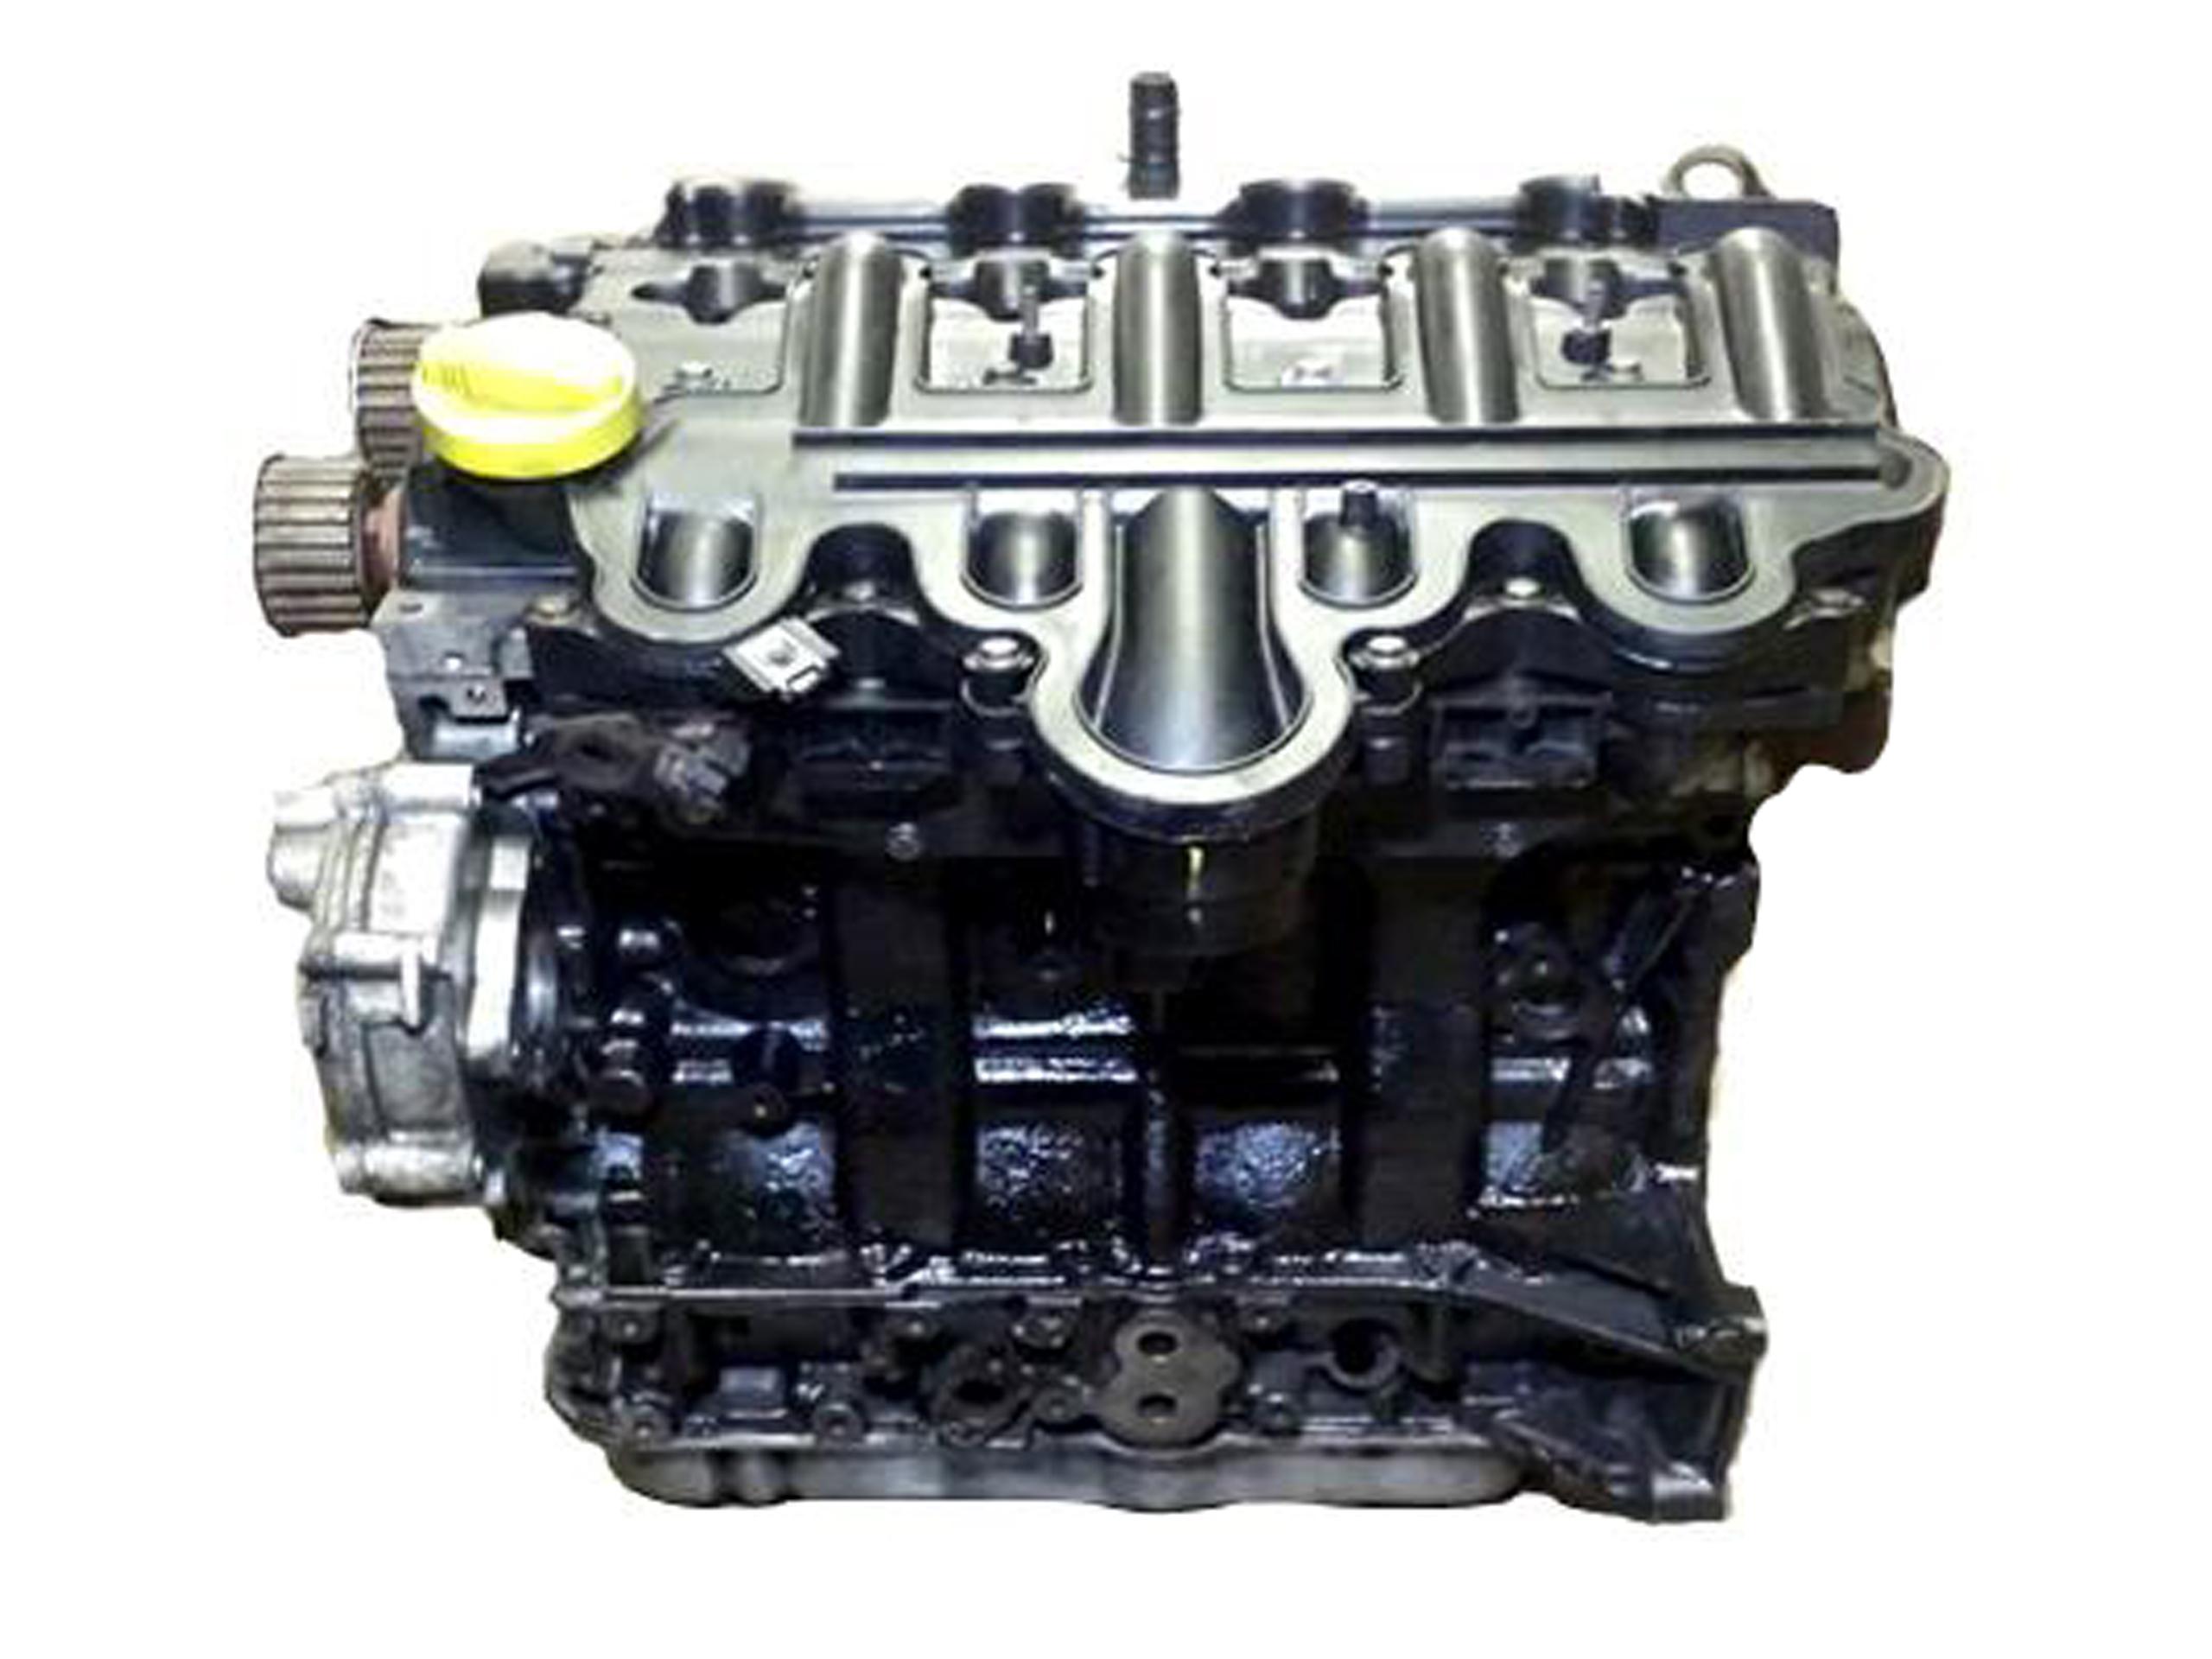 RENAULT MASTER 2.5 DCI ДВИГАТЕЛЬ G9U 120KM ENGINE